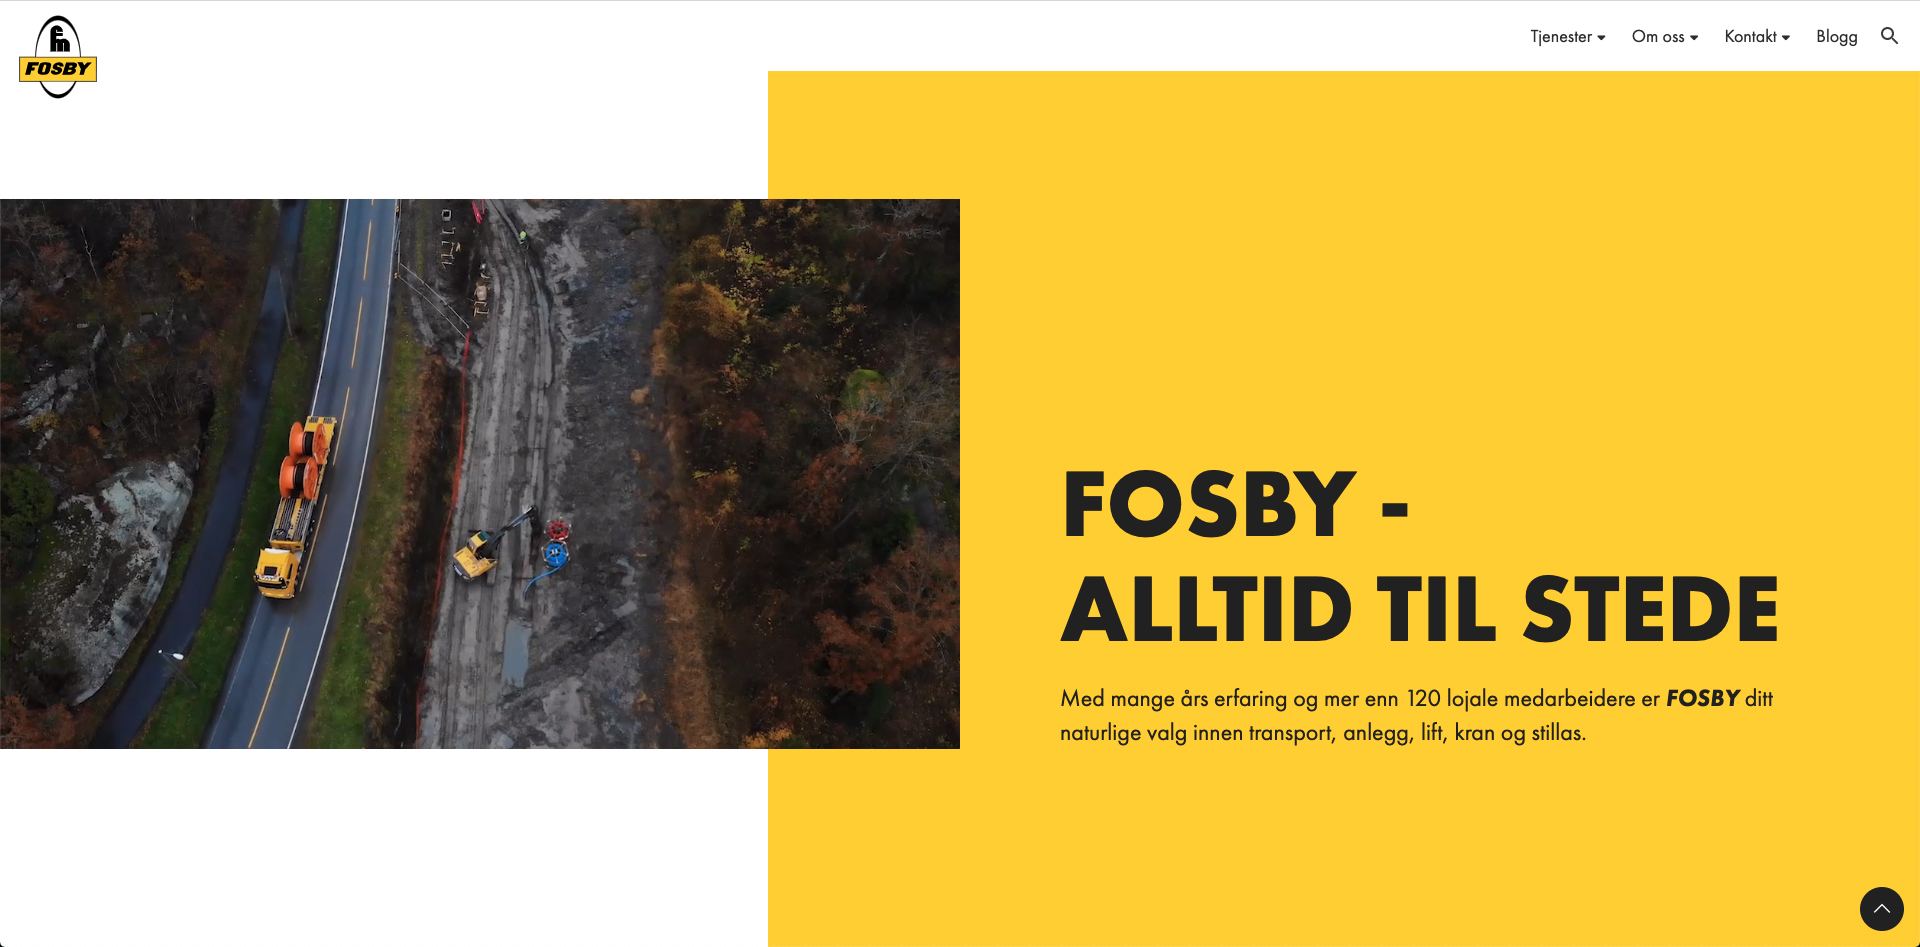 Fosby